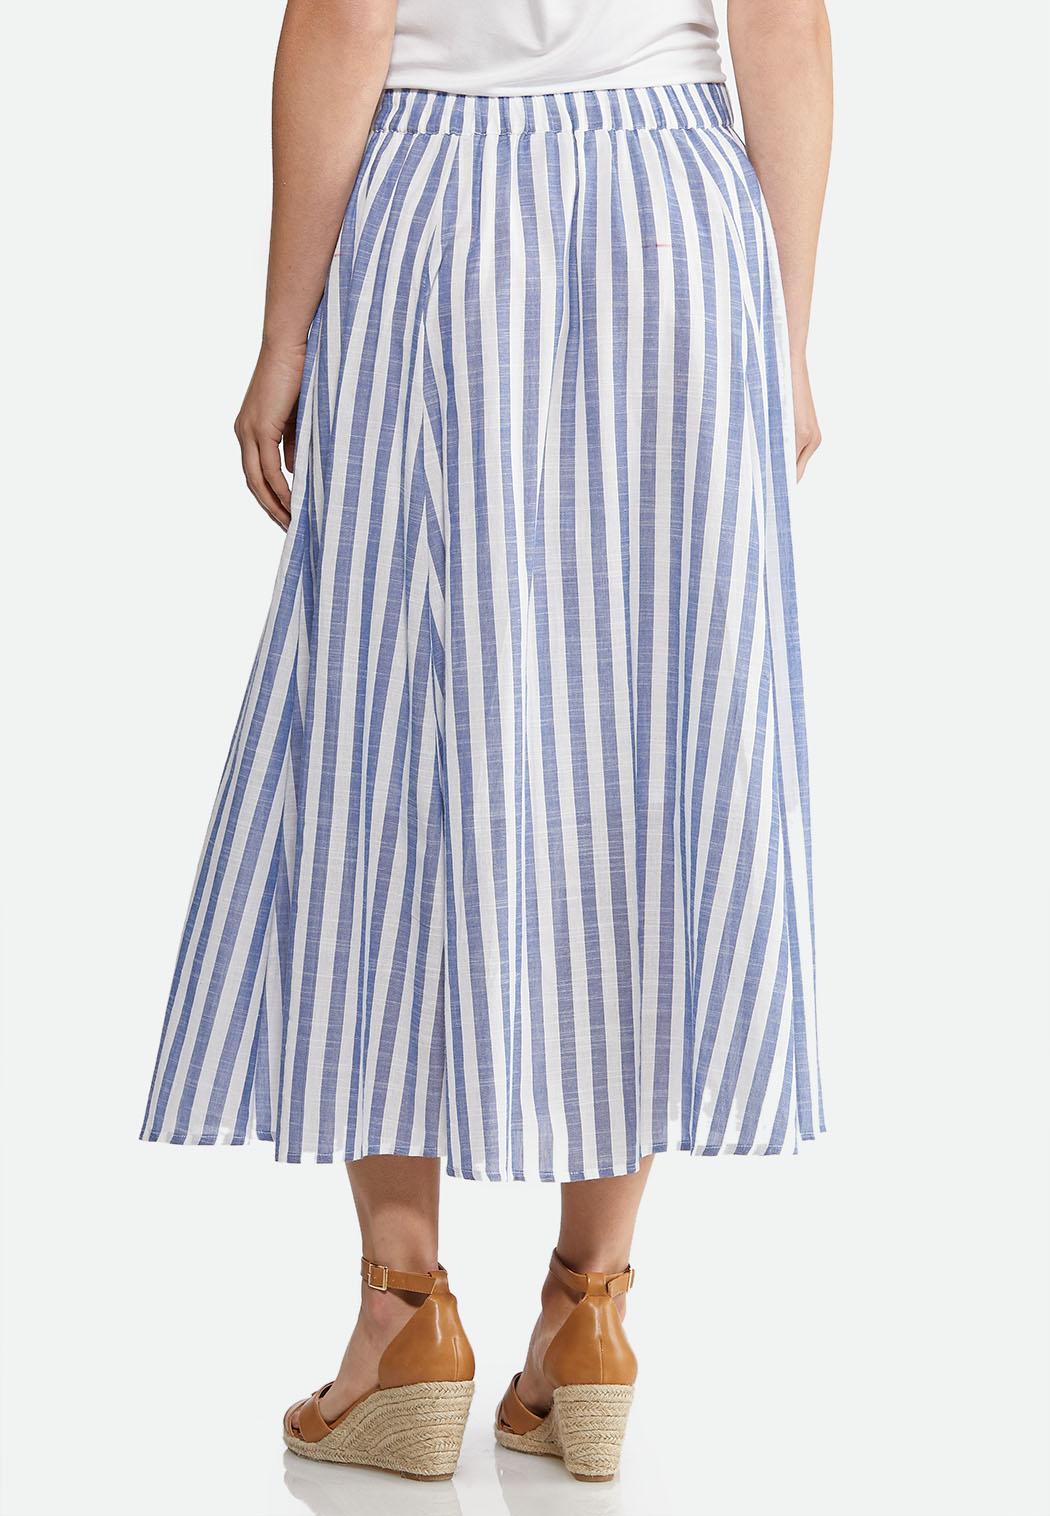 Linen Button Front Midi Skirt  (Item #43878922)